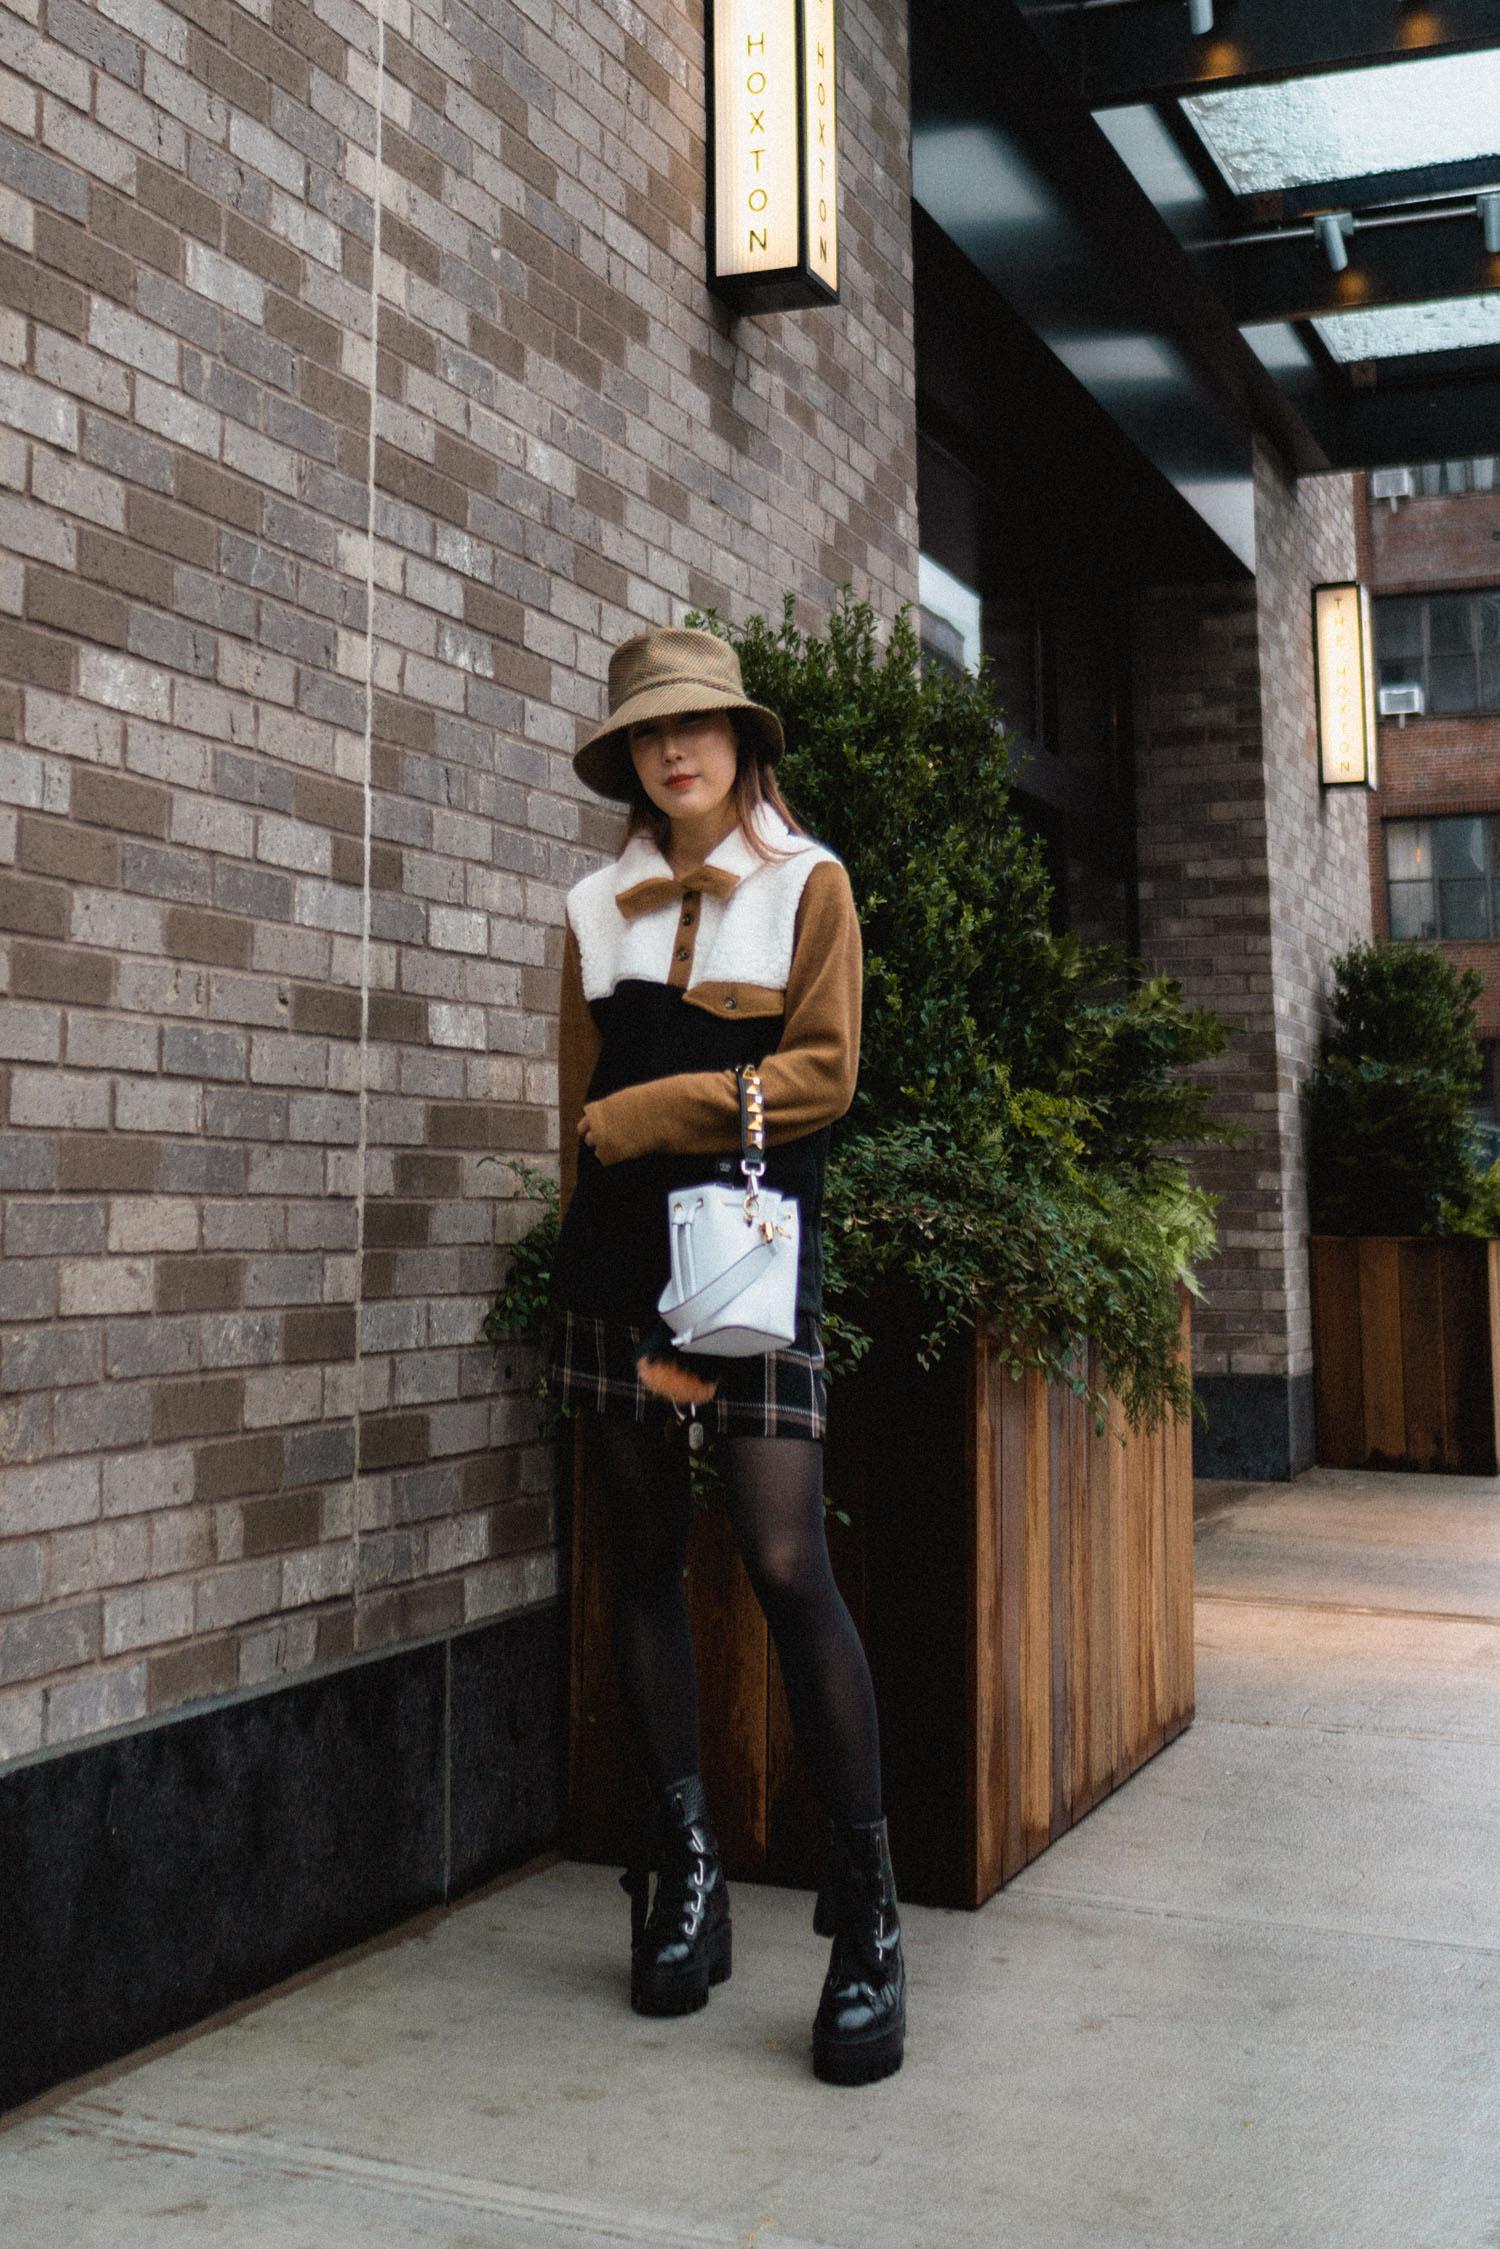 Donni Sweater , Reformation Skirt, Ellery Boots,  Fendi Bag ,  Eric Javits Hat